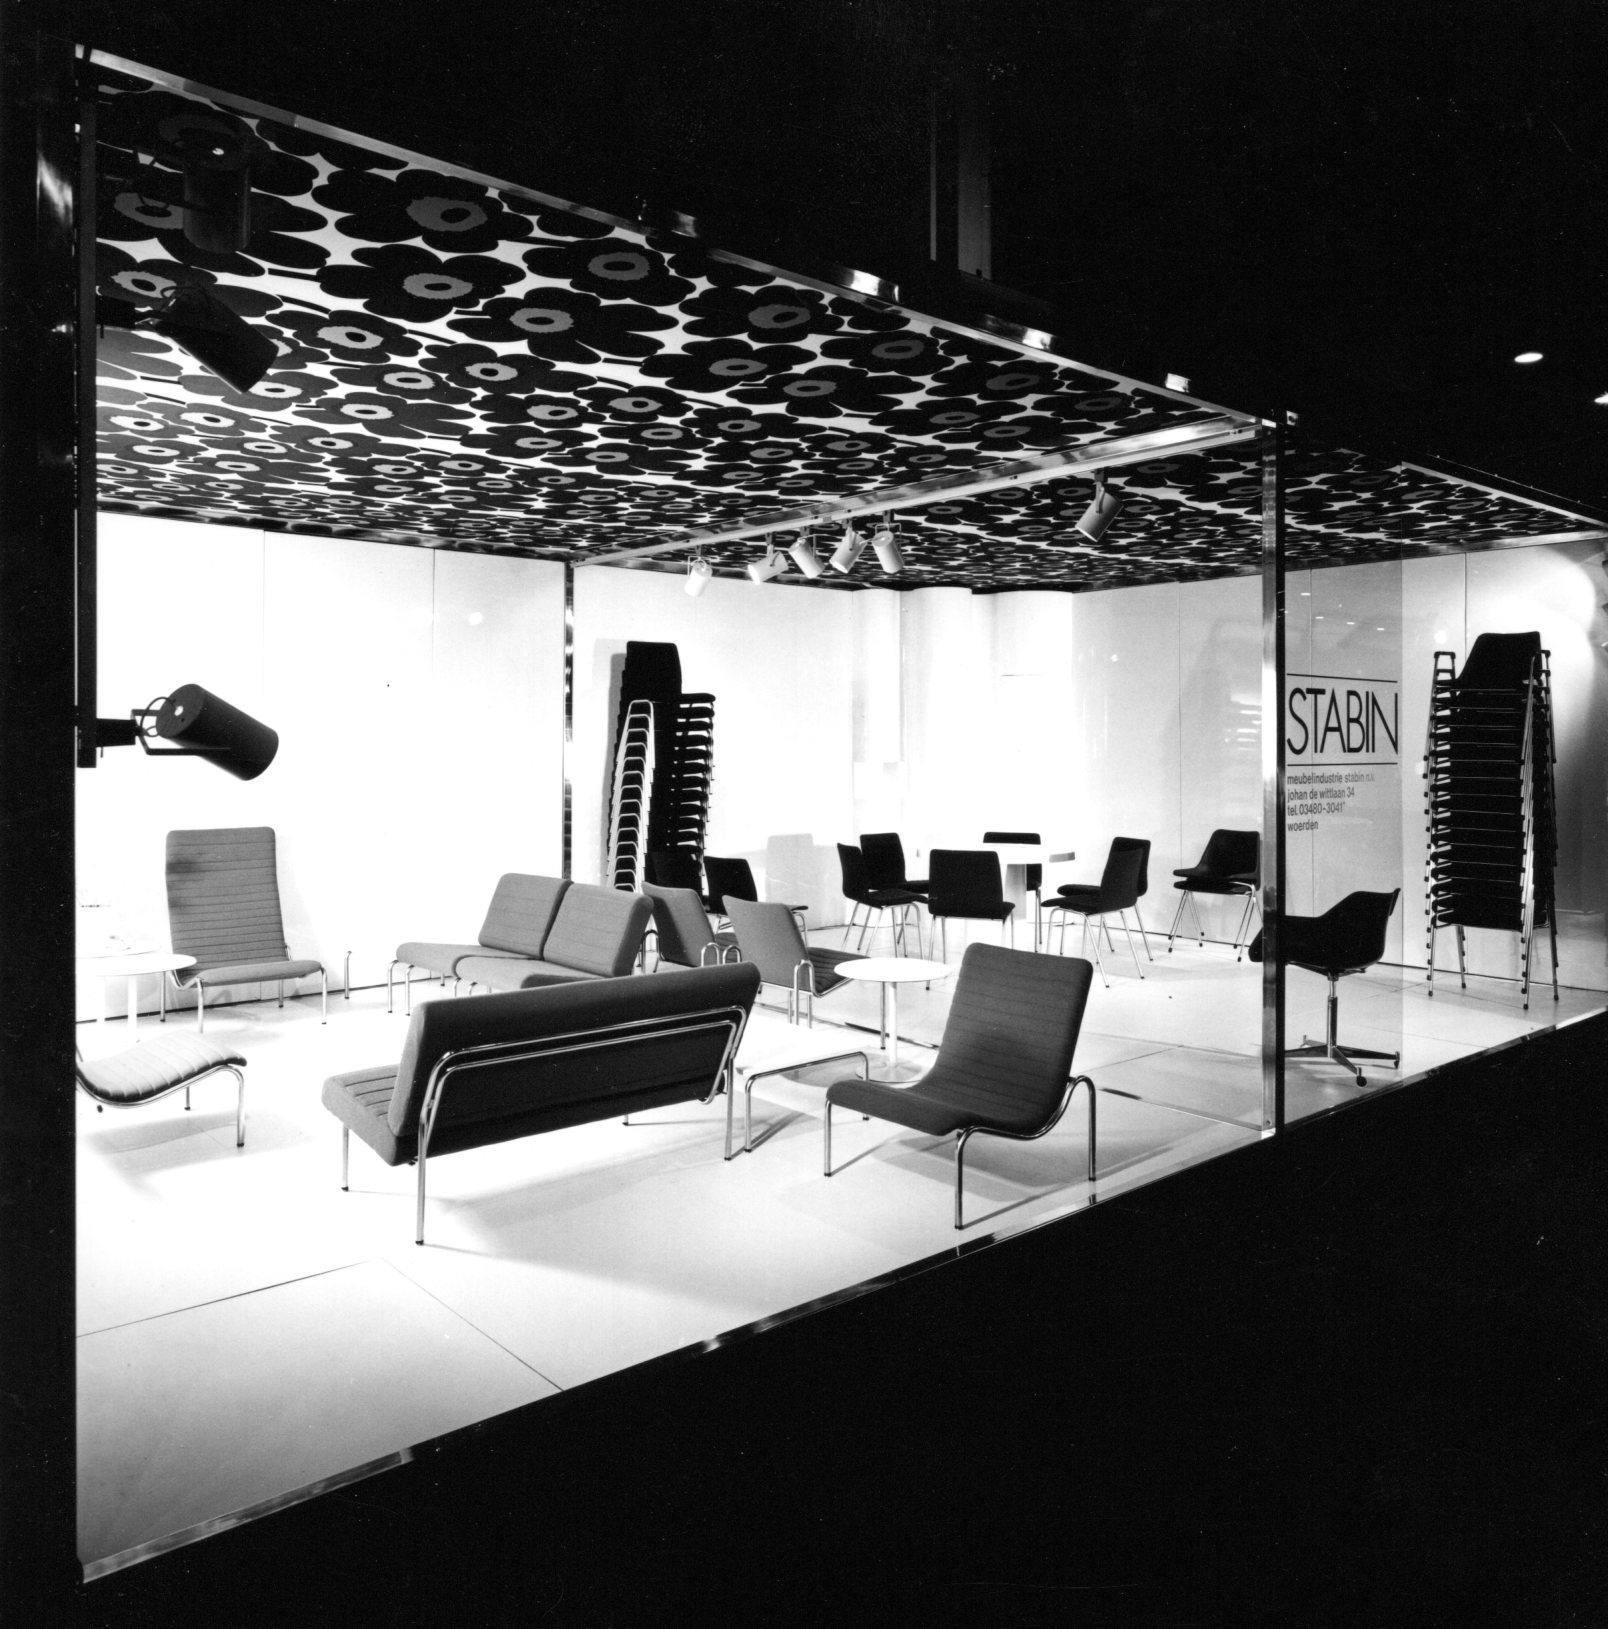 Stabin stand, Utrecht 1969. Photo Jan Versnel